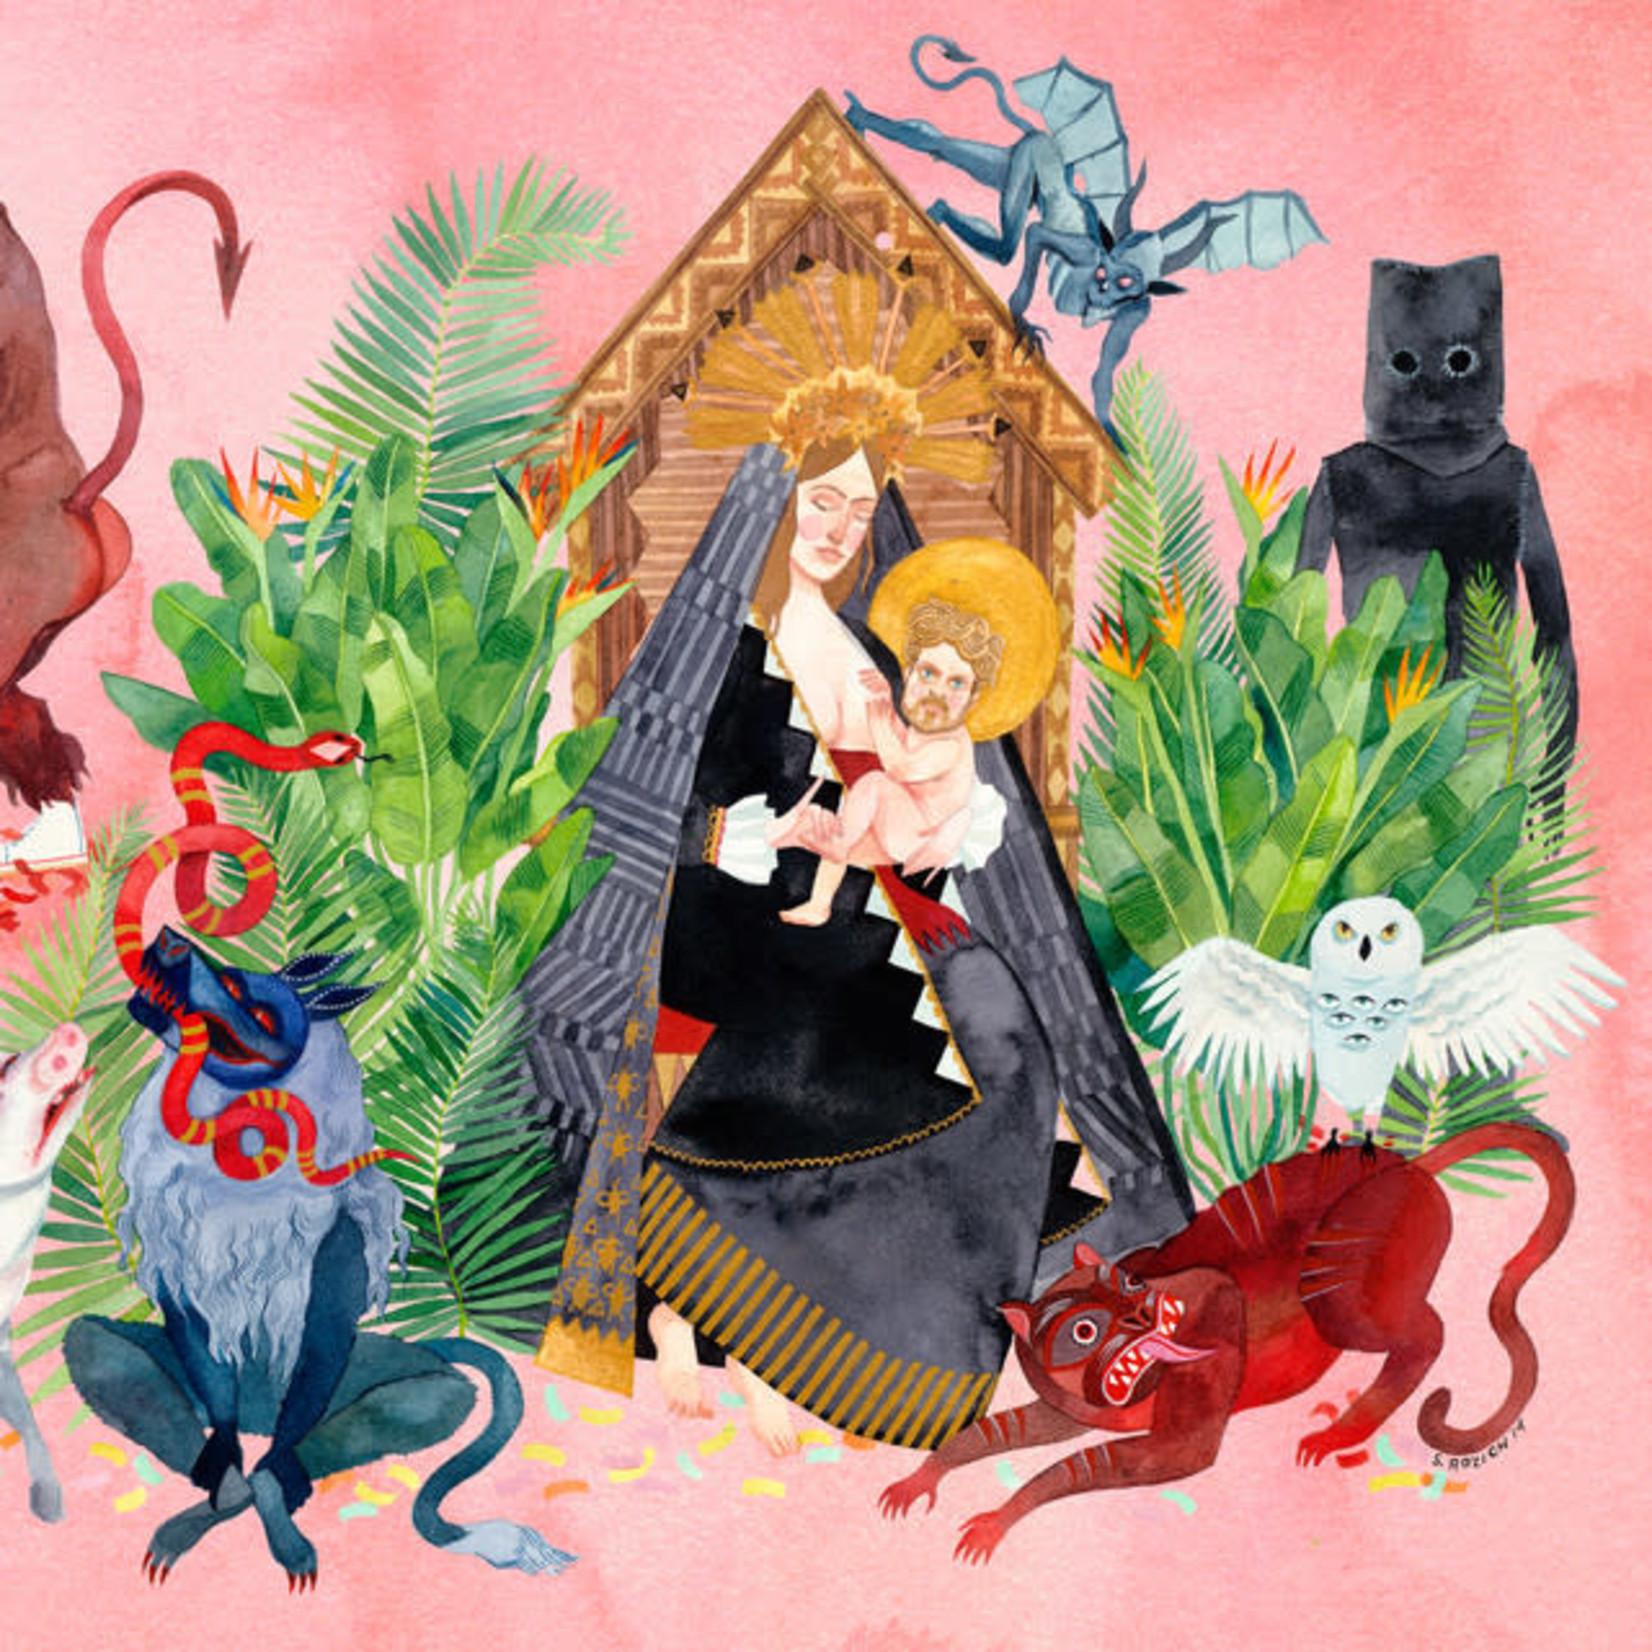 Vinyl Father John Misty - I Love You Honeybear